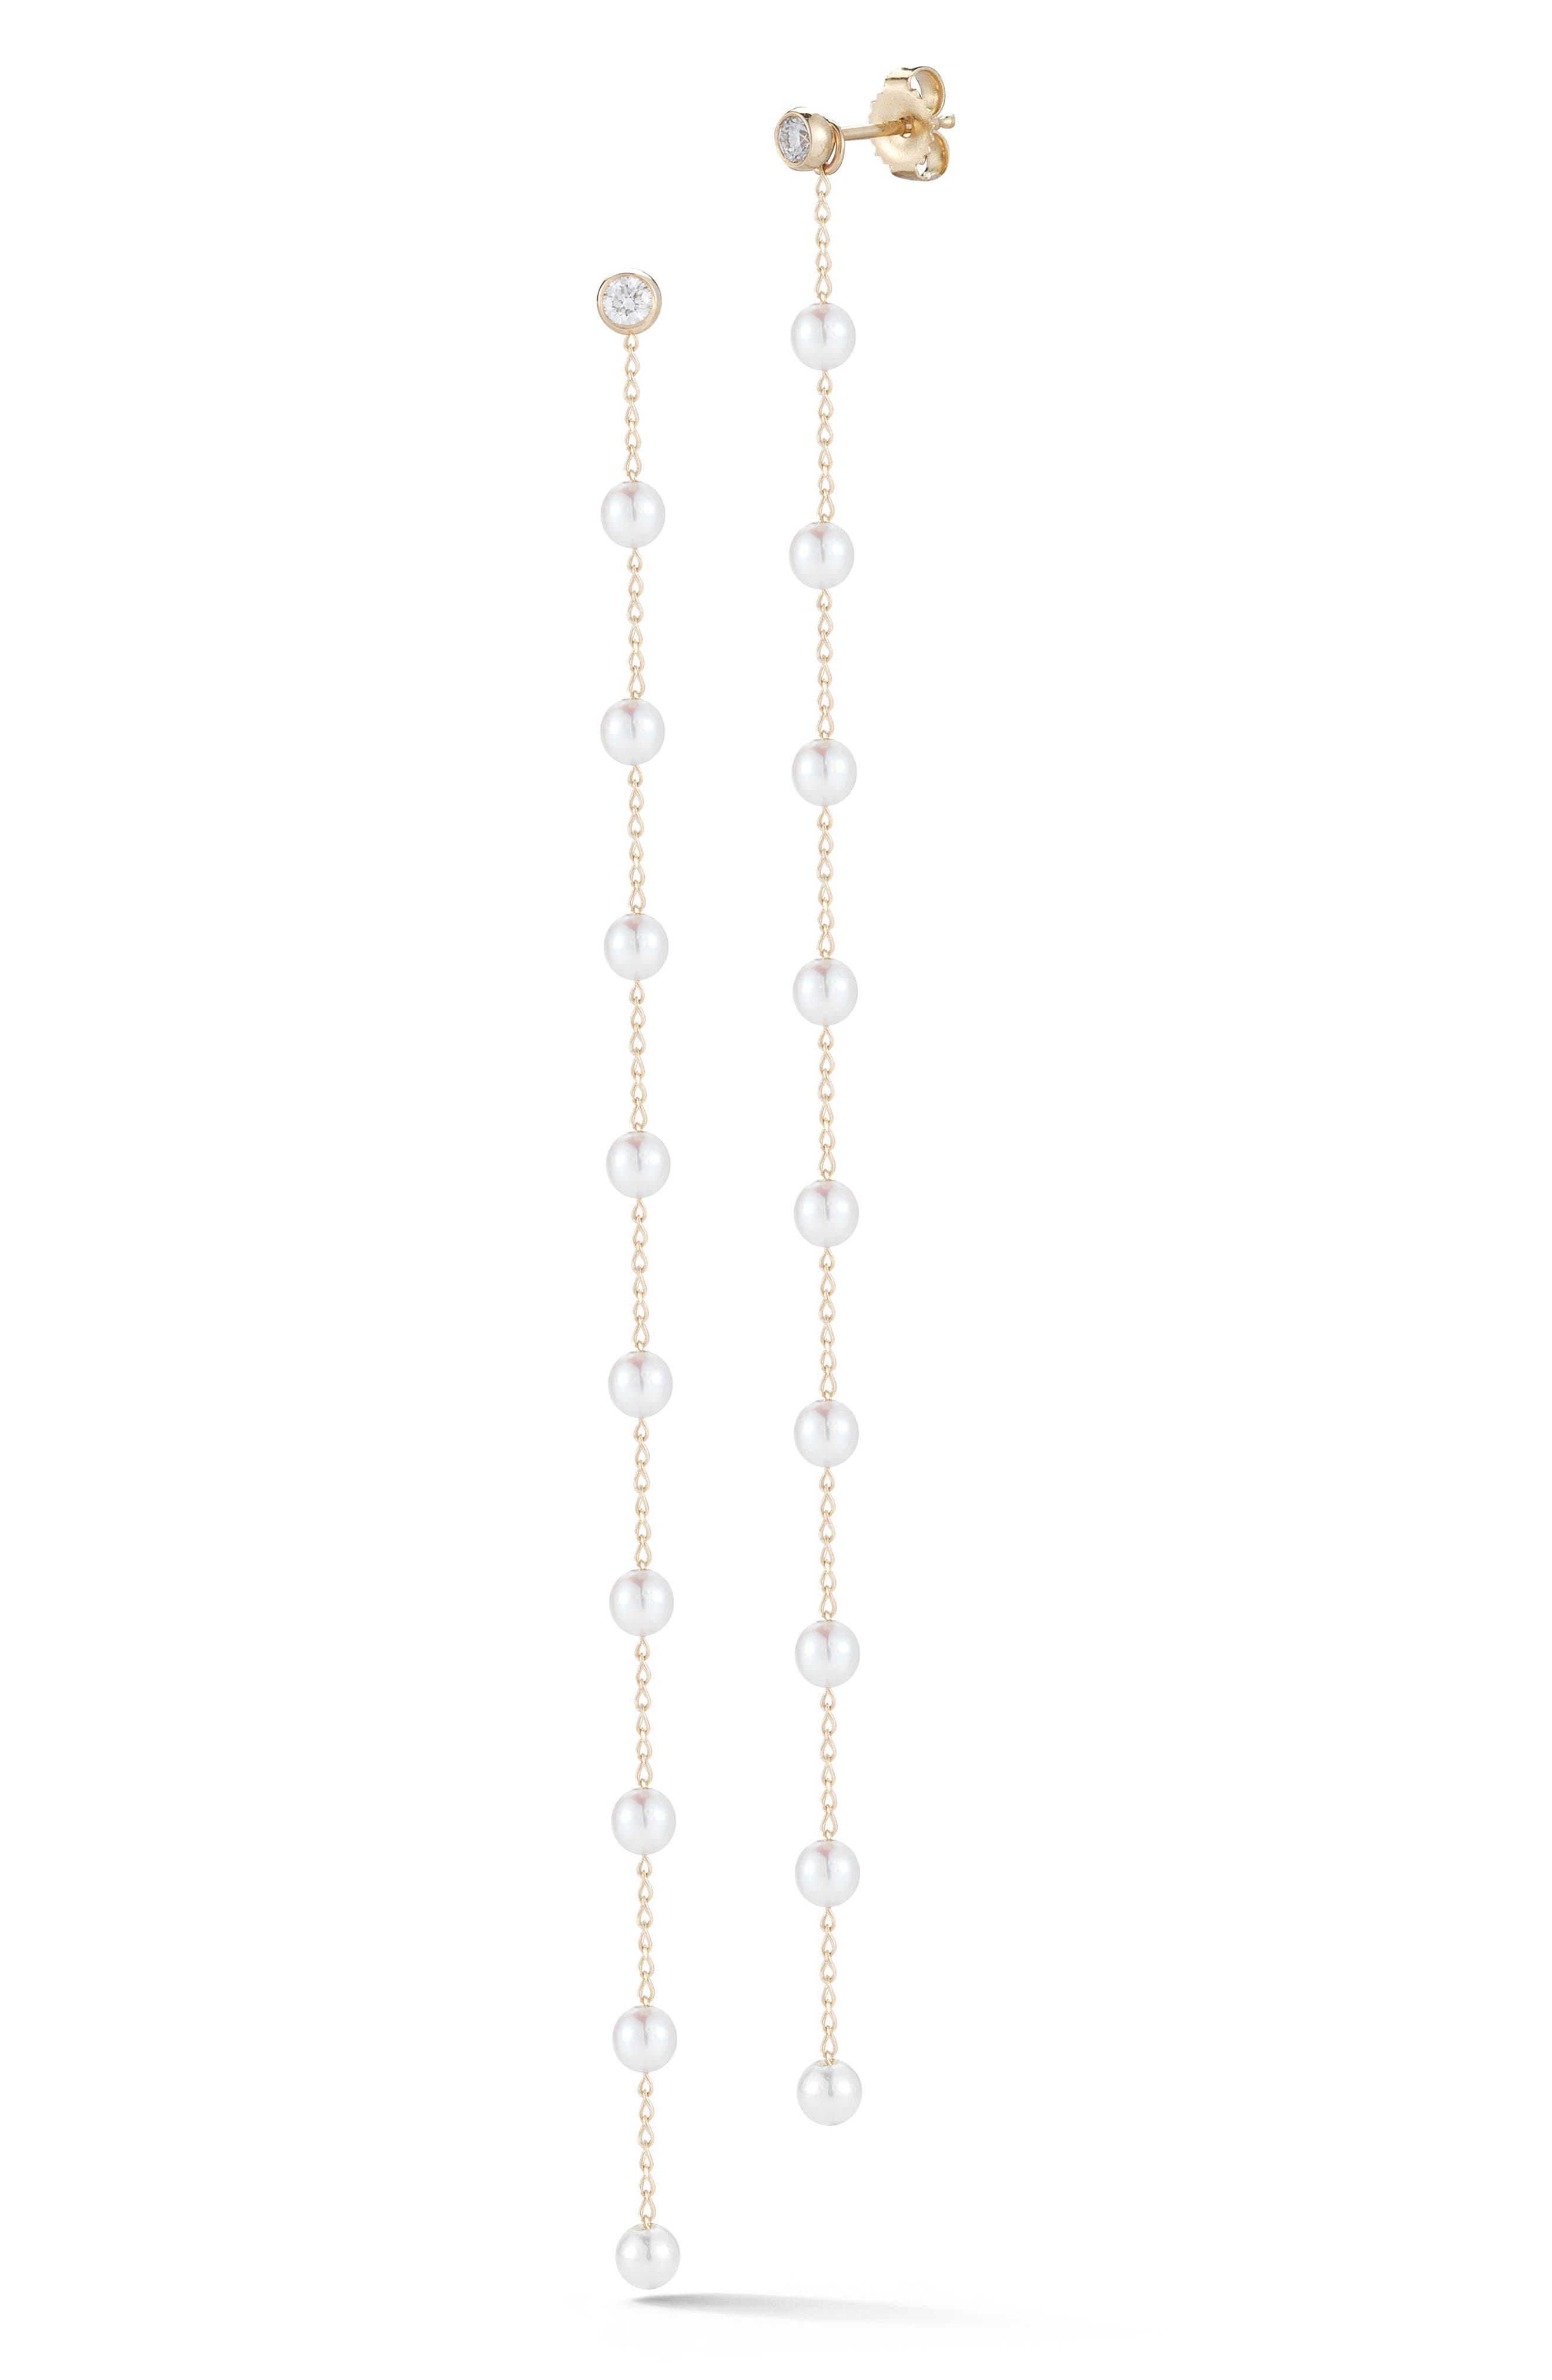 Long Pearl & Diamond Drop Earrings,                         Main,                         color, Yellow Gold/ White Pearl